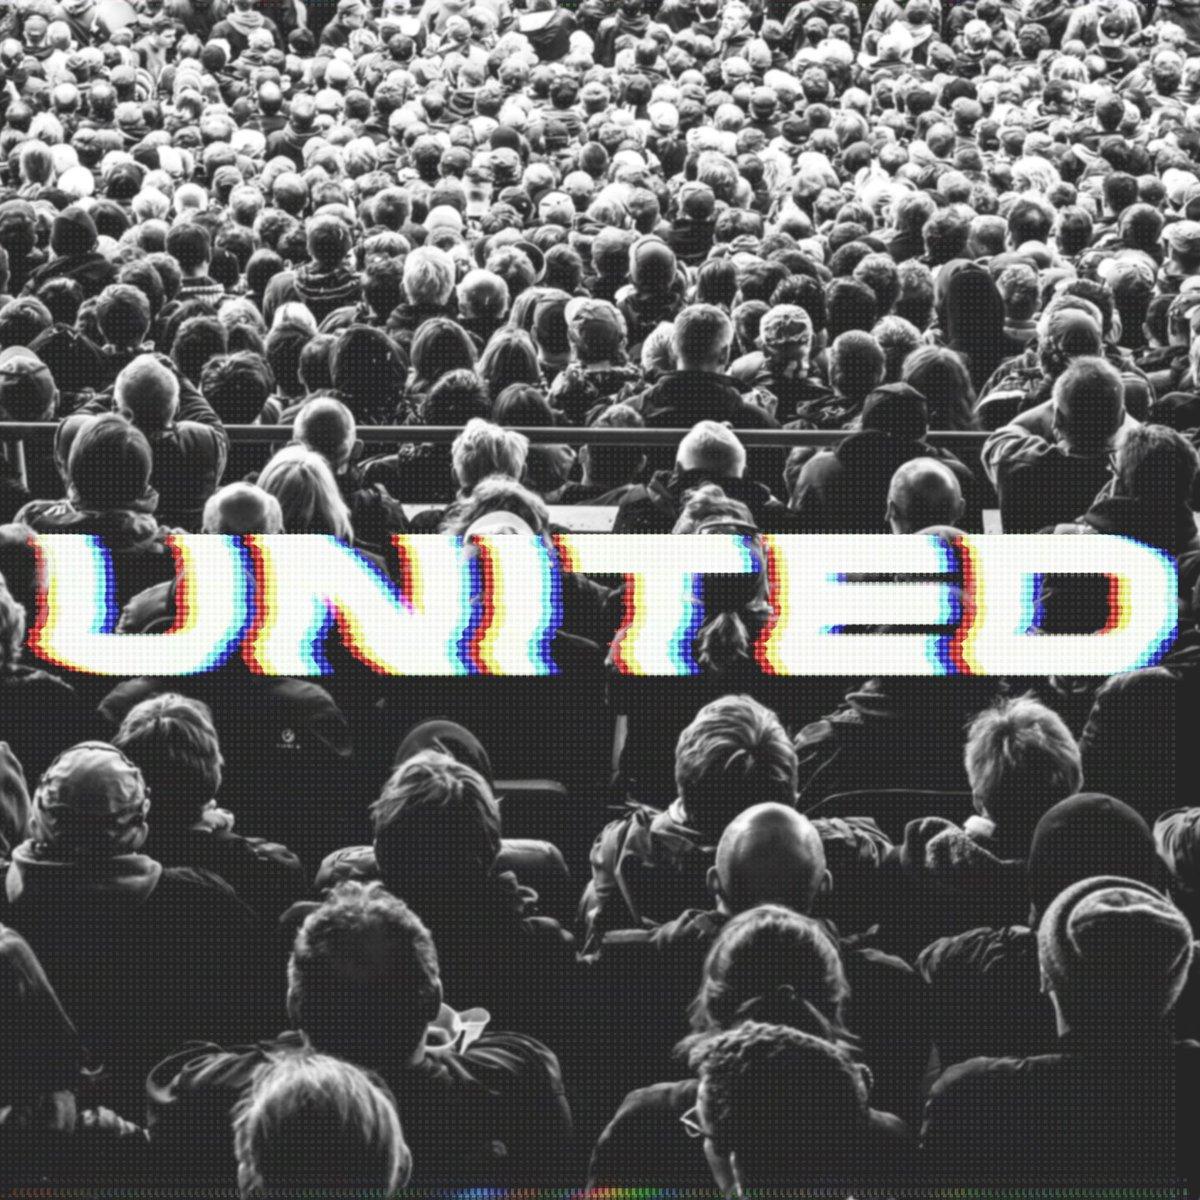 Hillsong United - People 2019 English Christian Live Album